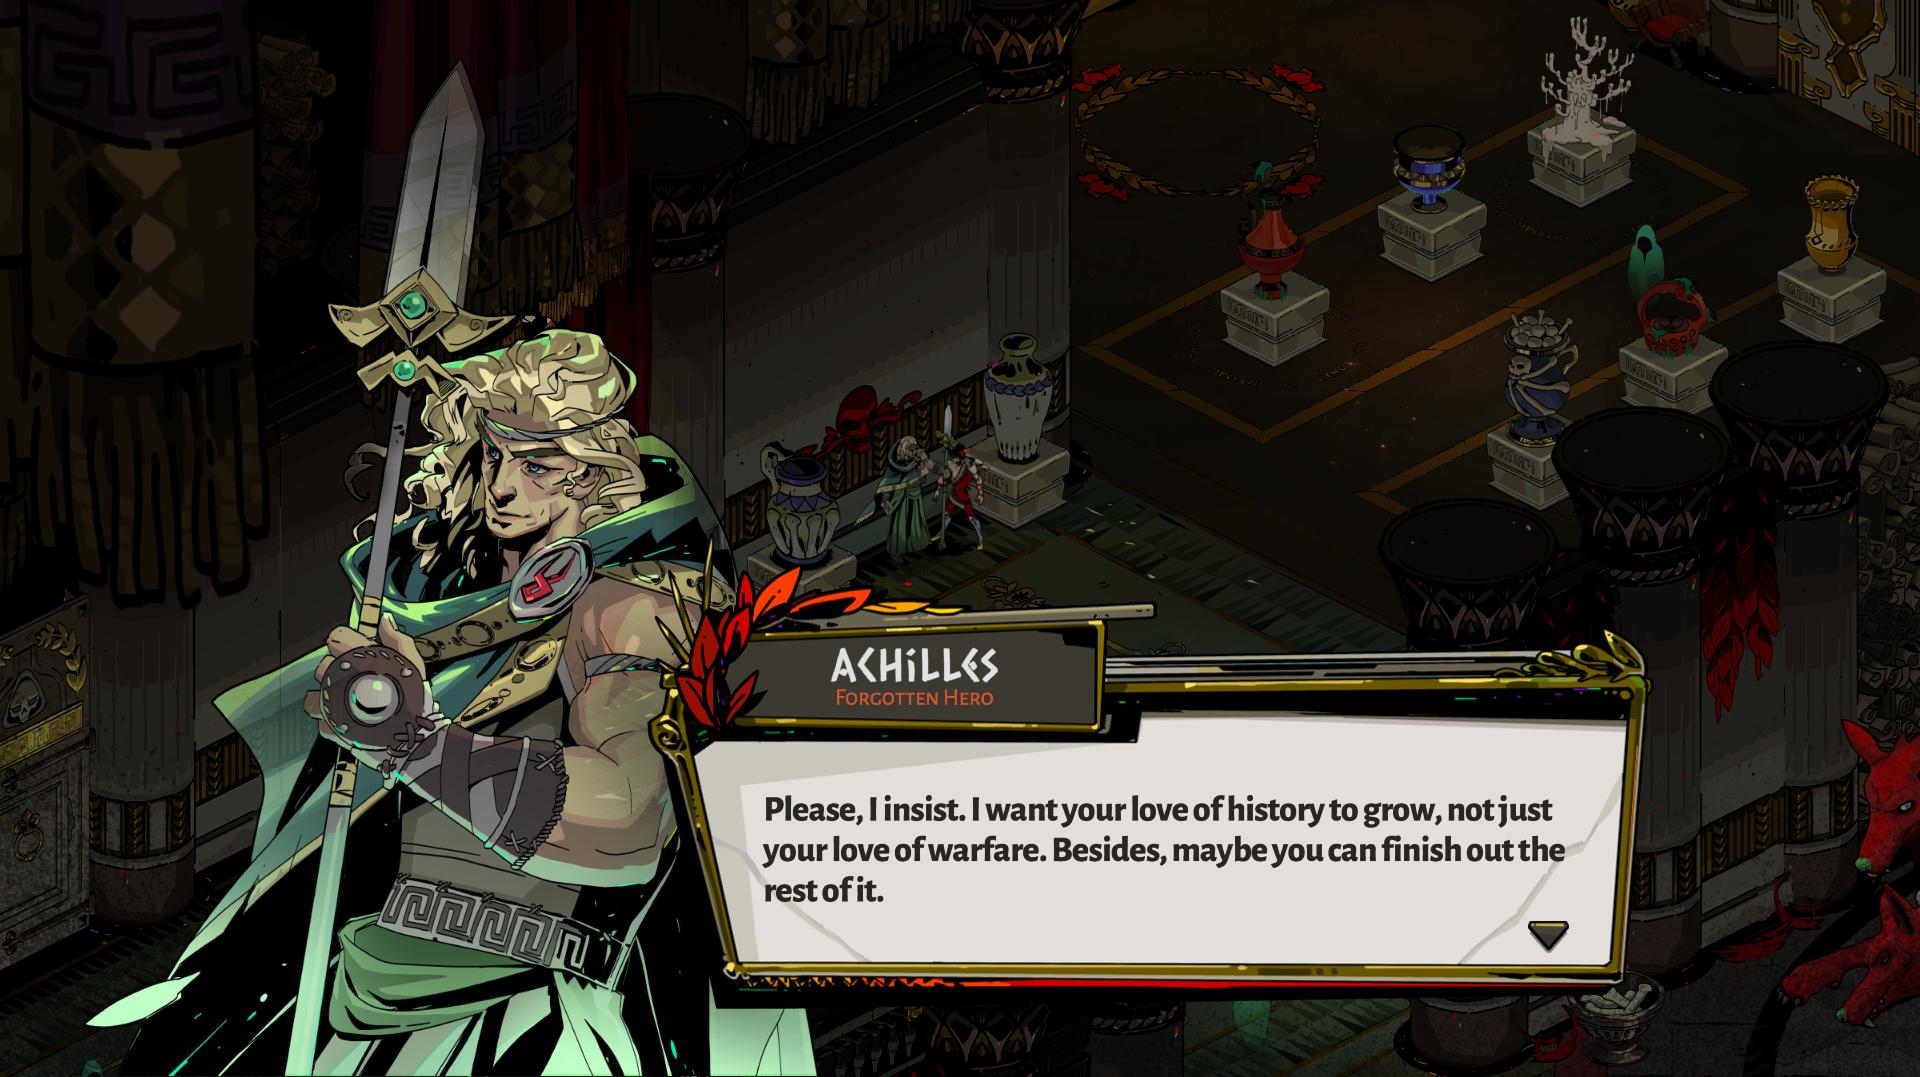 Achilles responds to Zagreus talking about Zagreus' love of history.